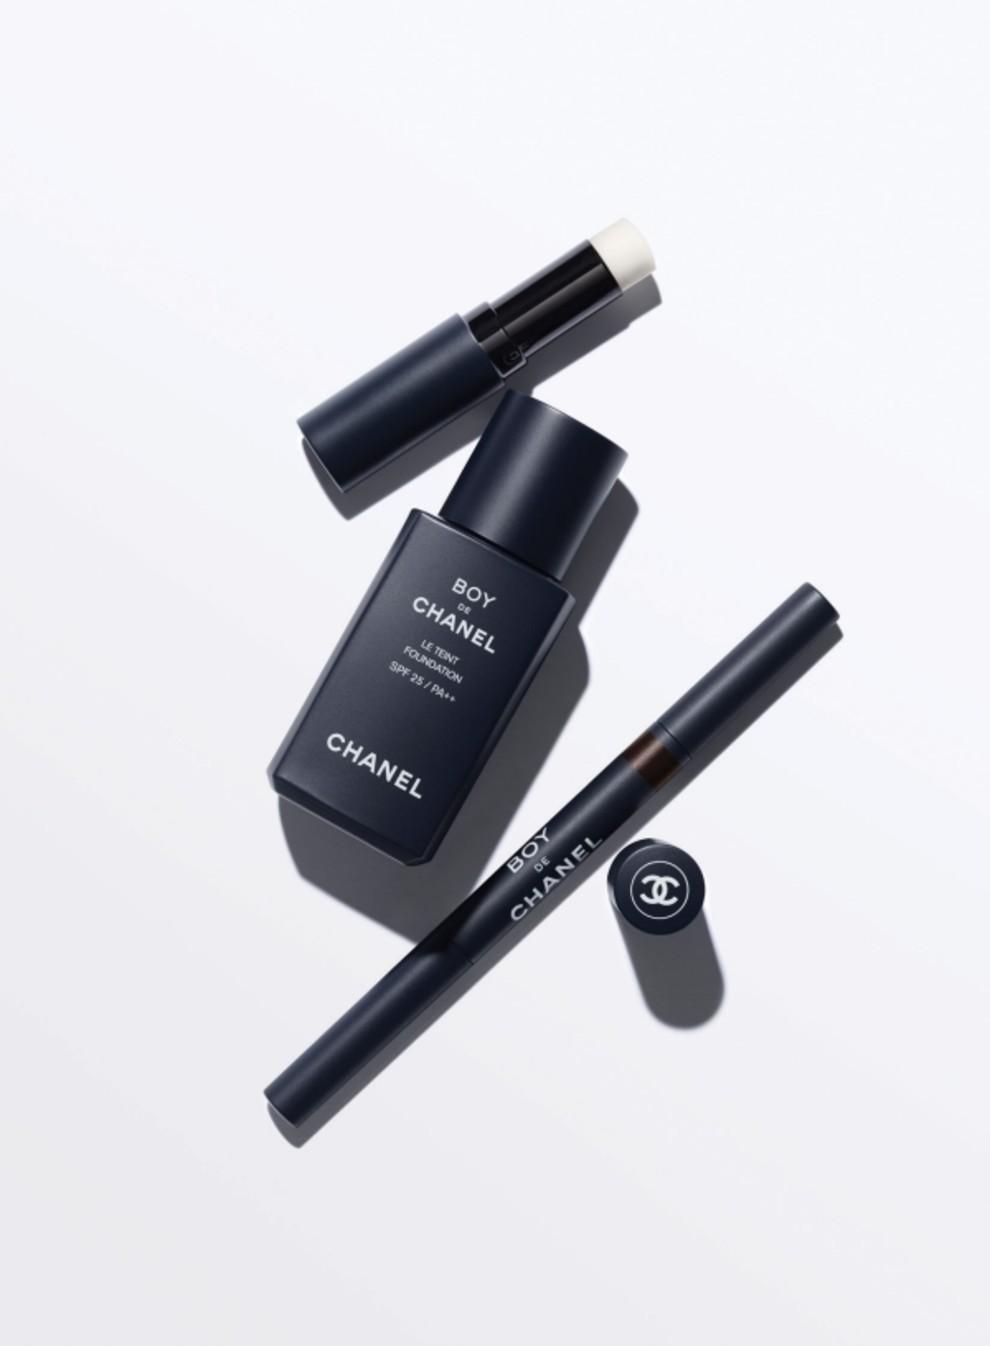 мужская коллекция макияжа Chanel Vogue Ukraine Vogue Ua